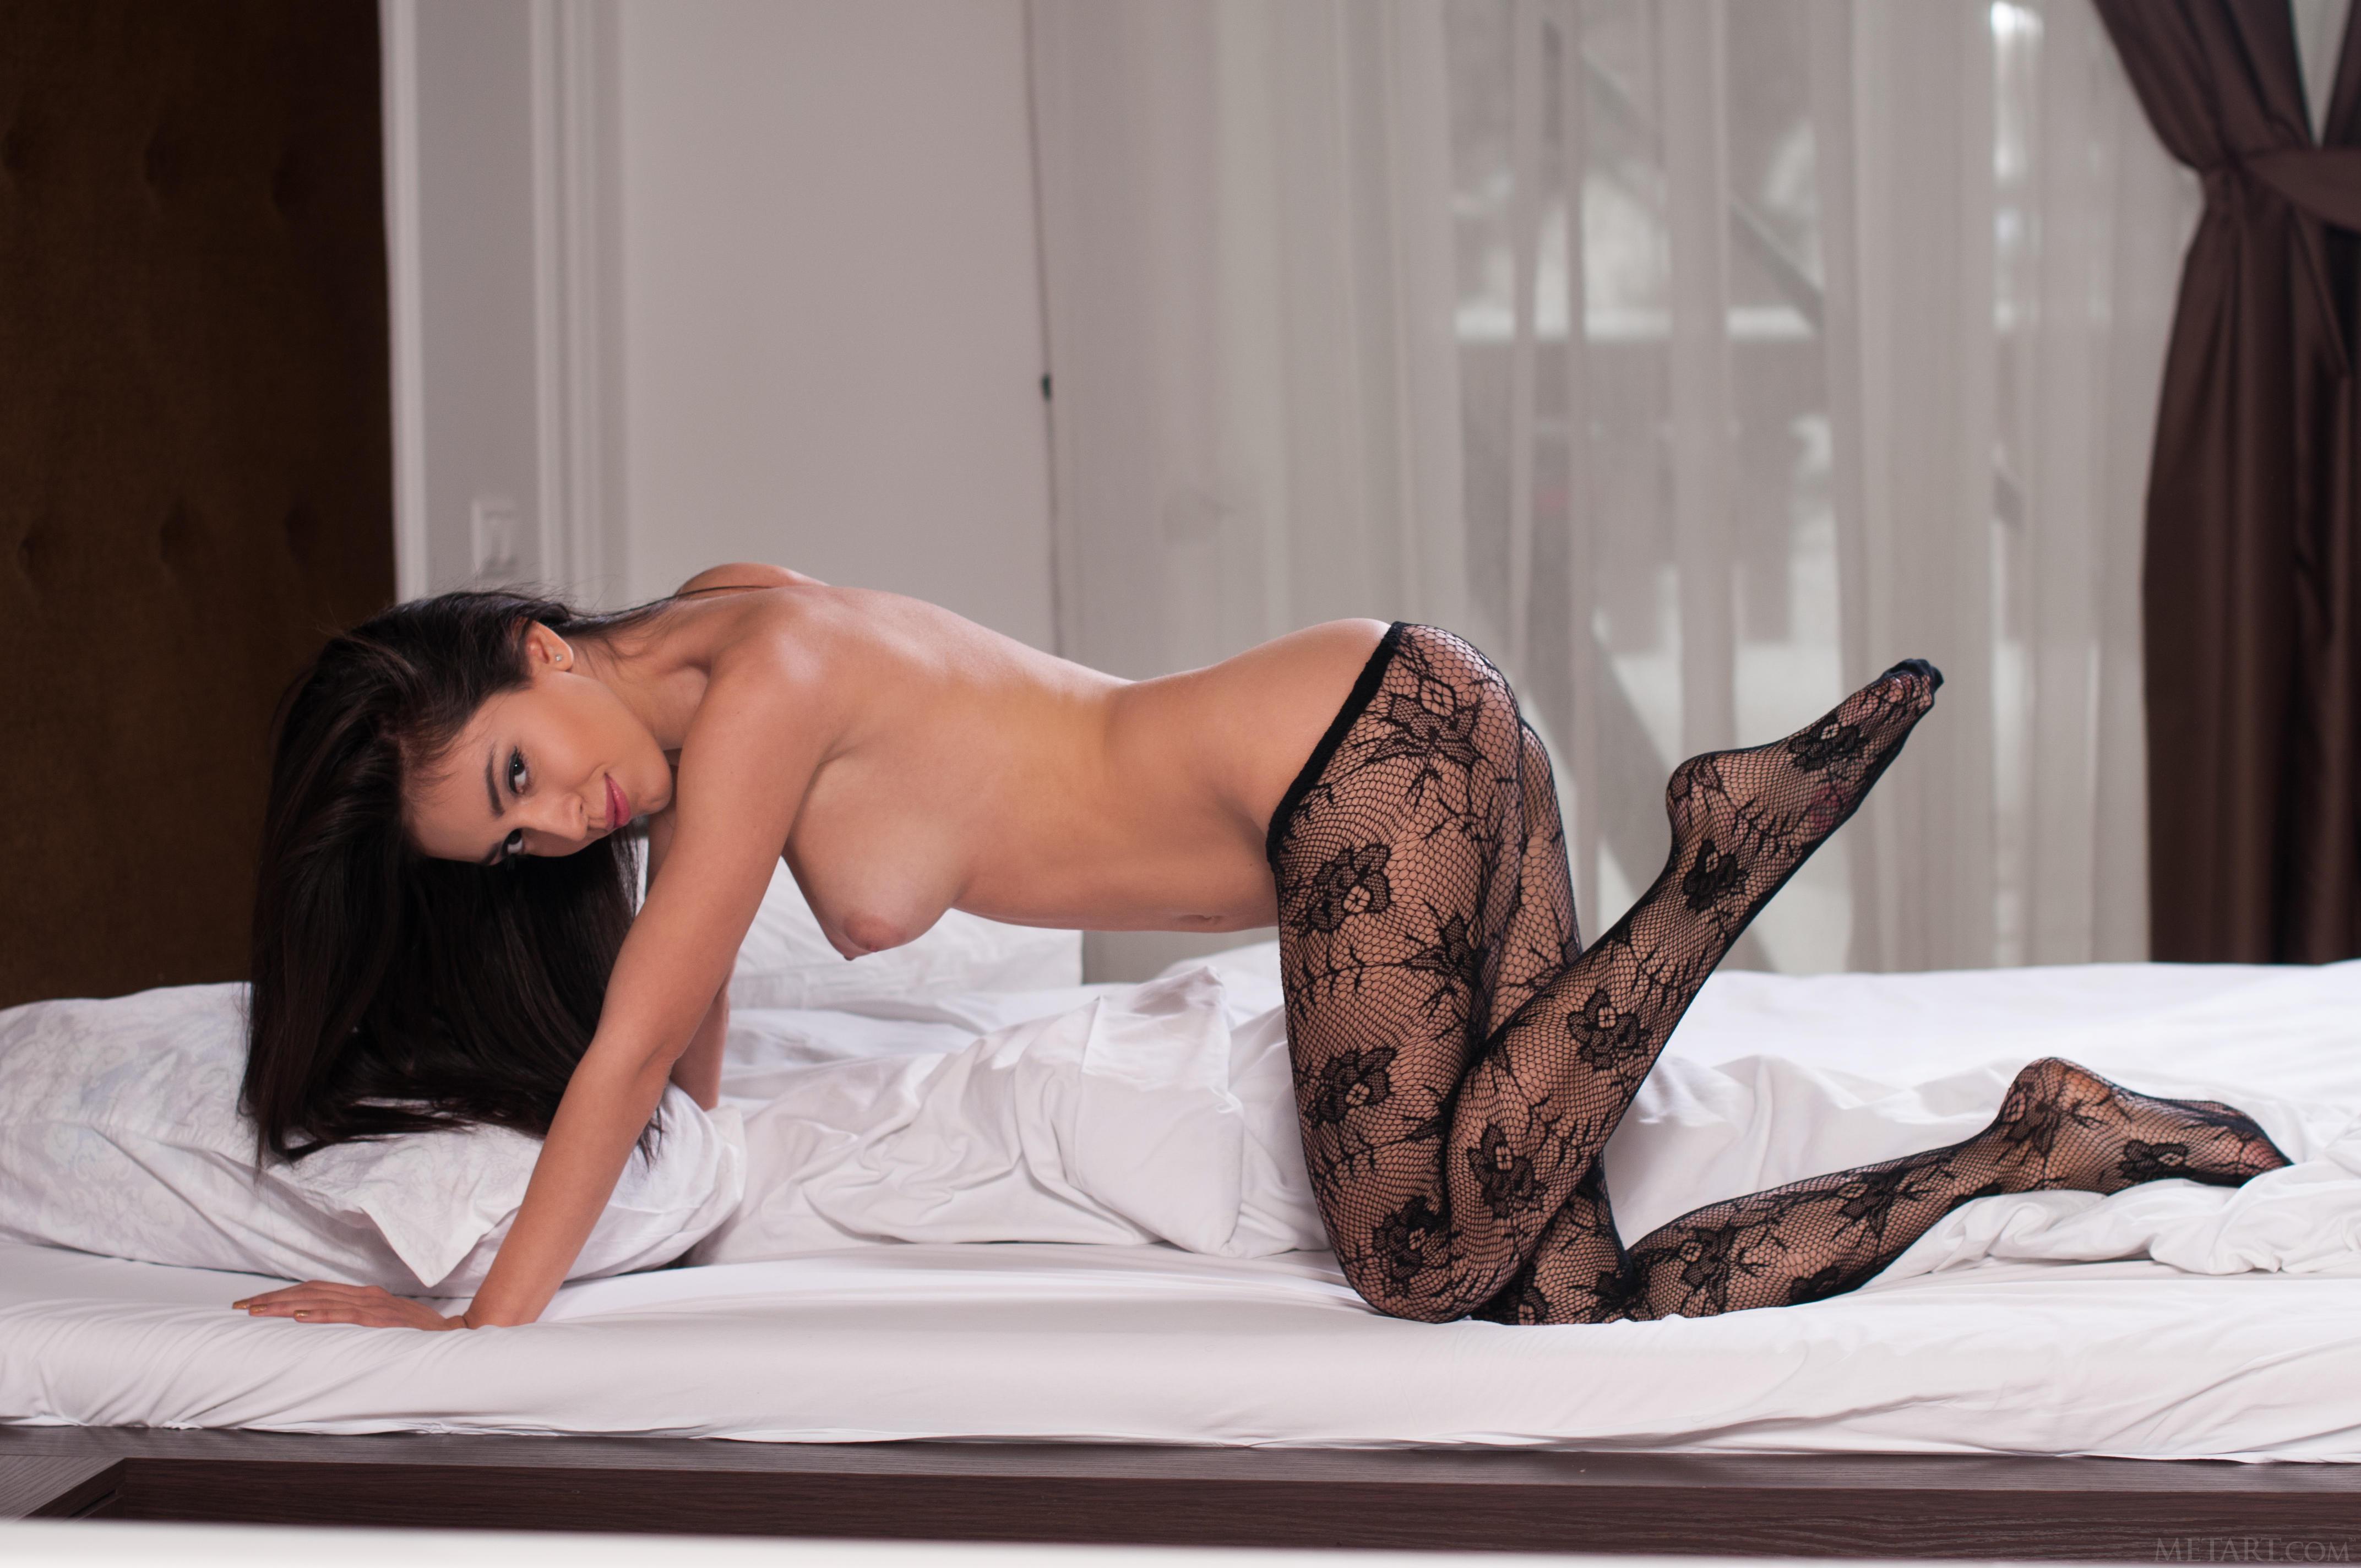 Хелена дженсен в порно 20 фотография